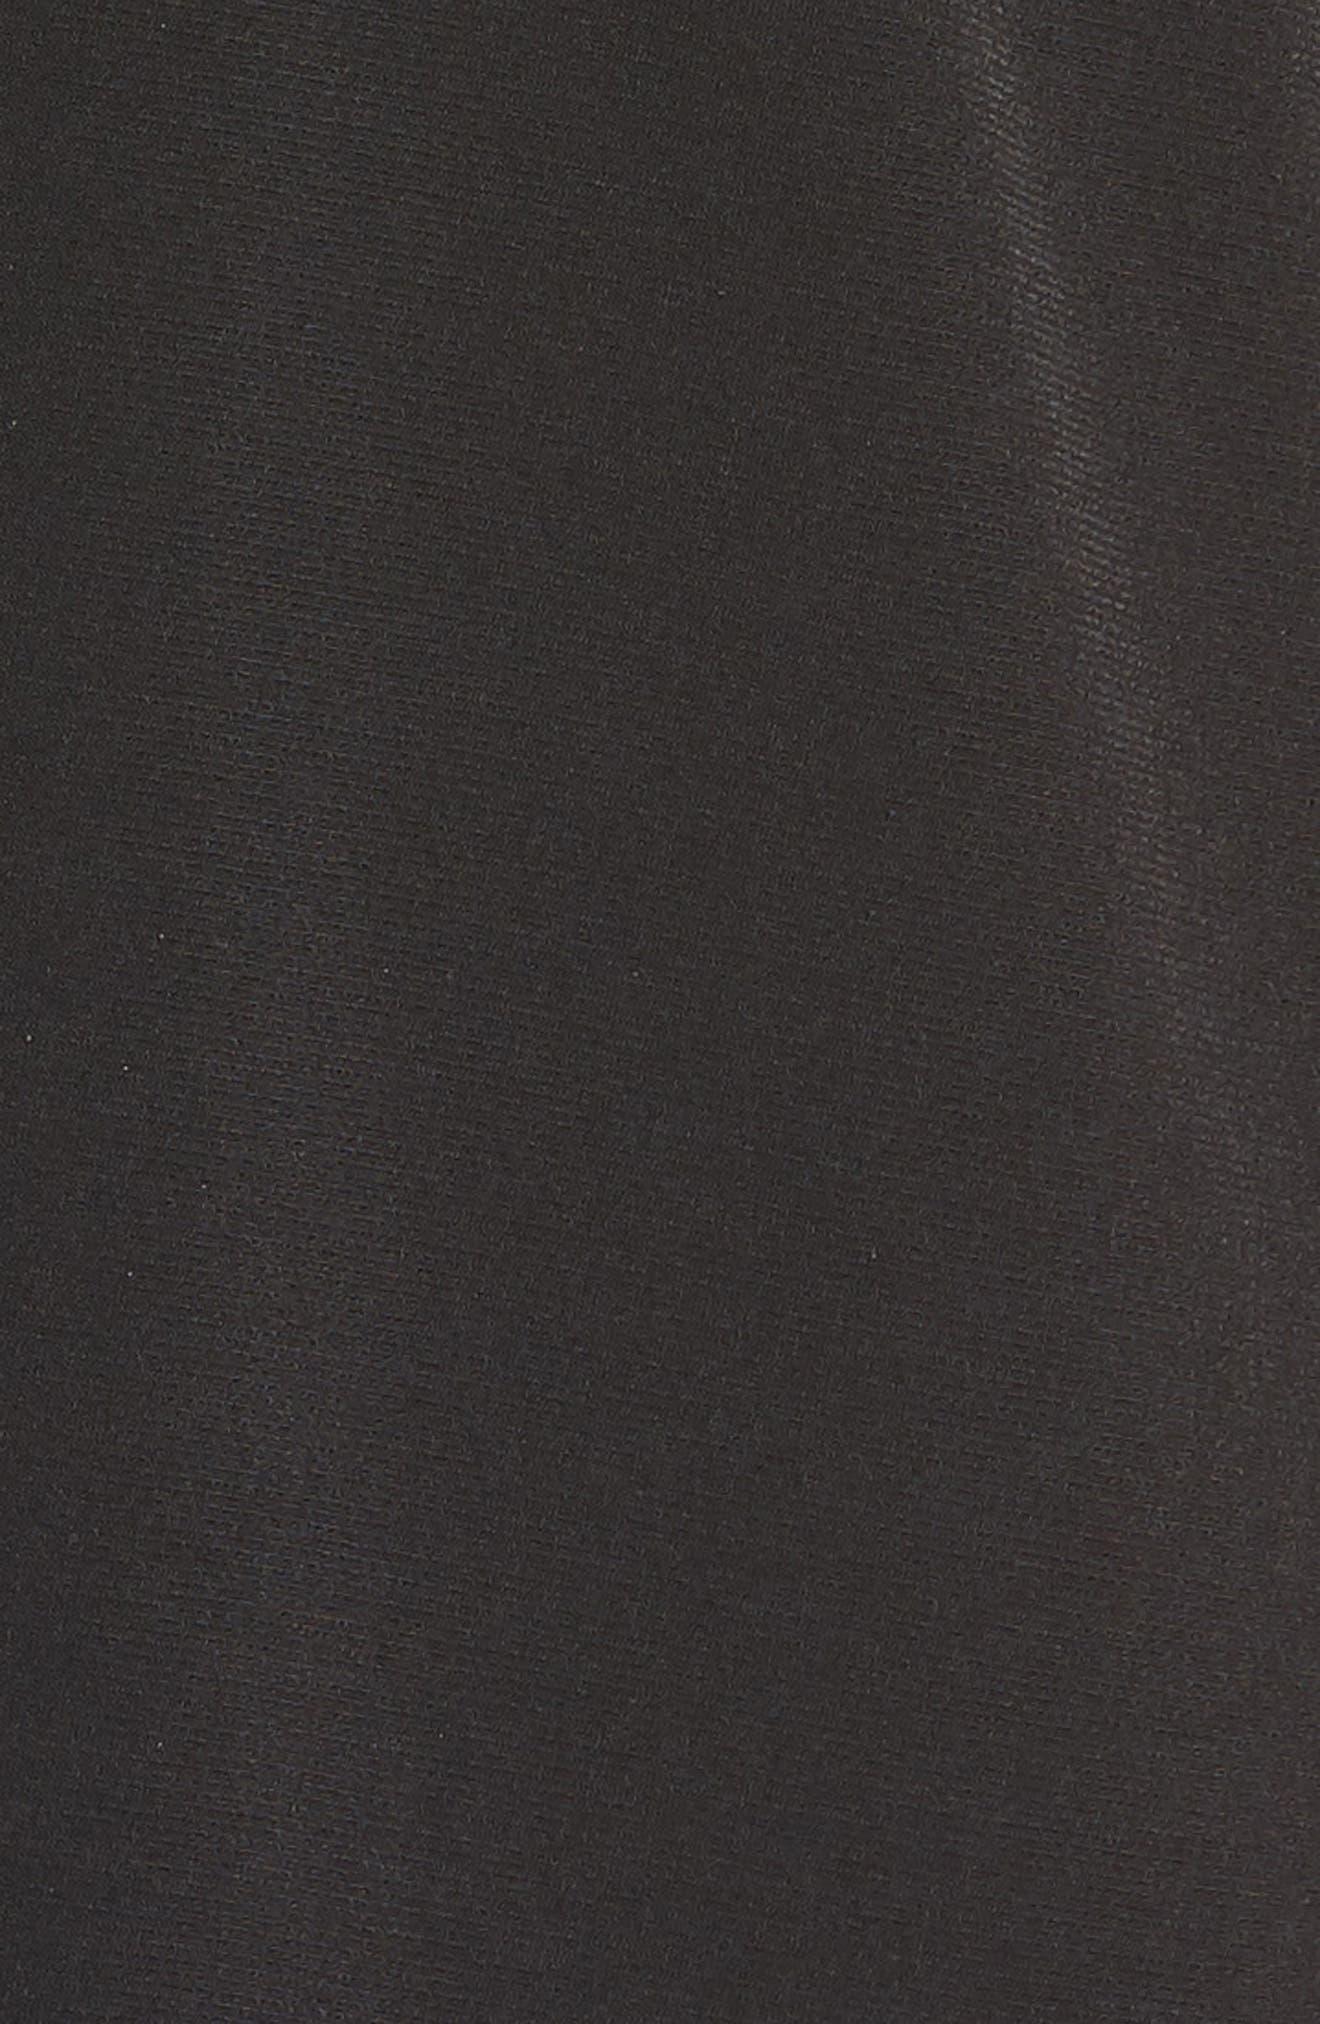 Chain Lace Caftan Top,                             Alternate thumbnail 6, color,                             Black/ Silver